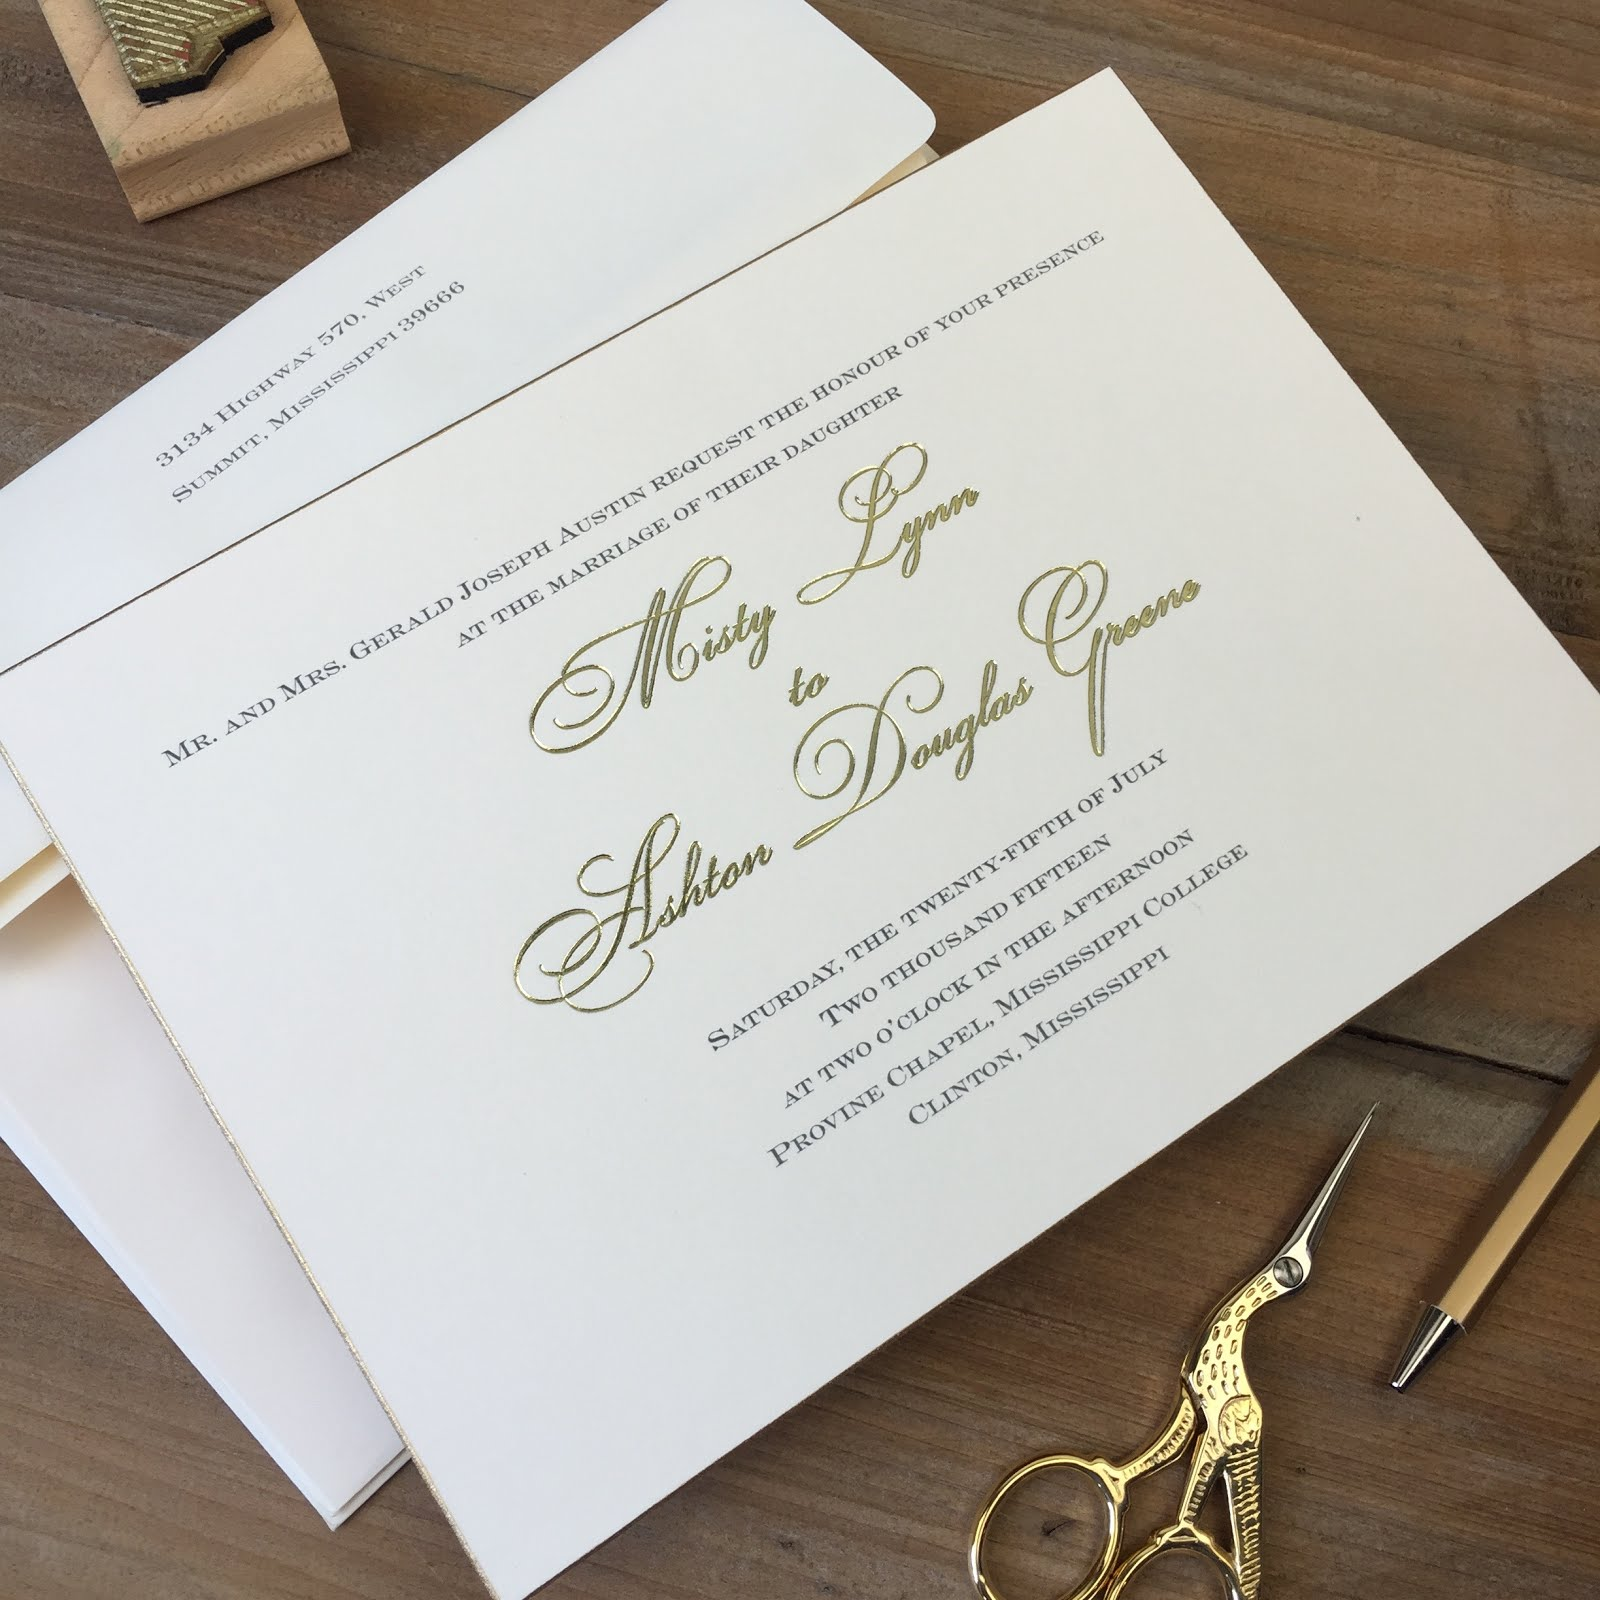 Misty Austin and Ashton Greene wedding invitations | Fresh Ink ...